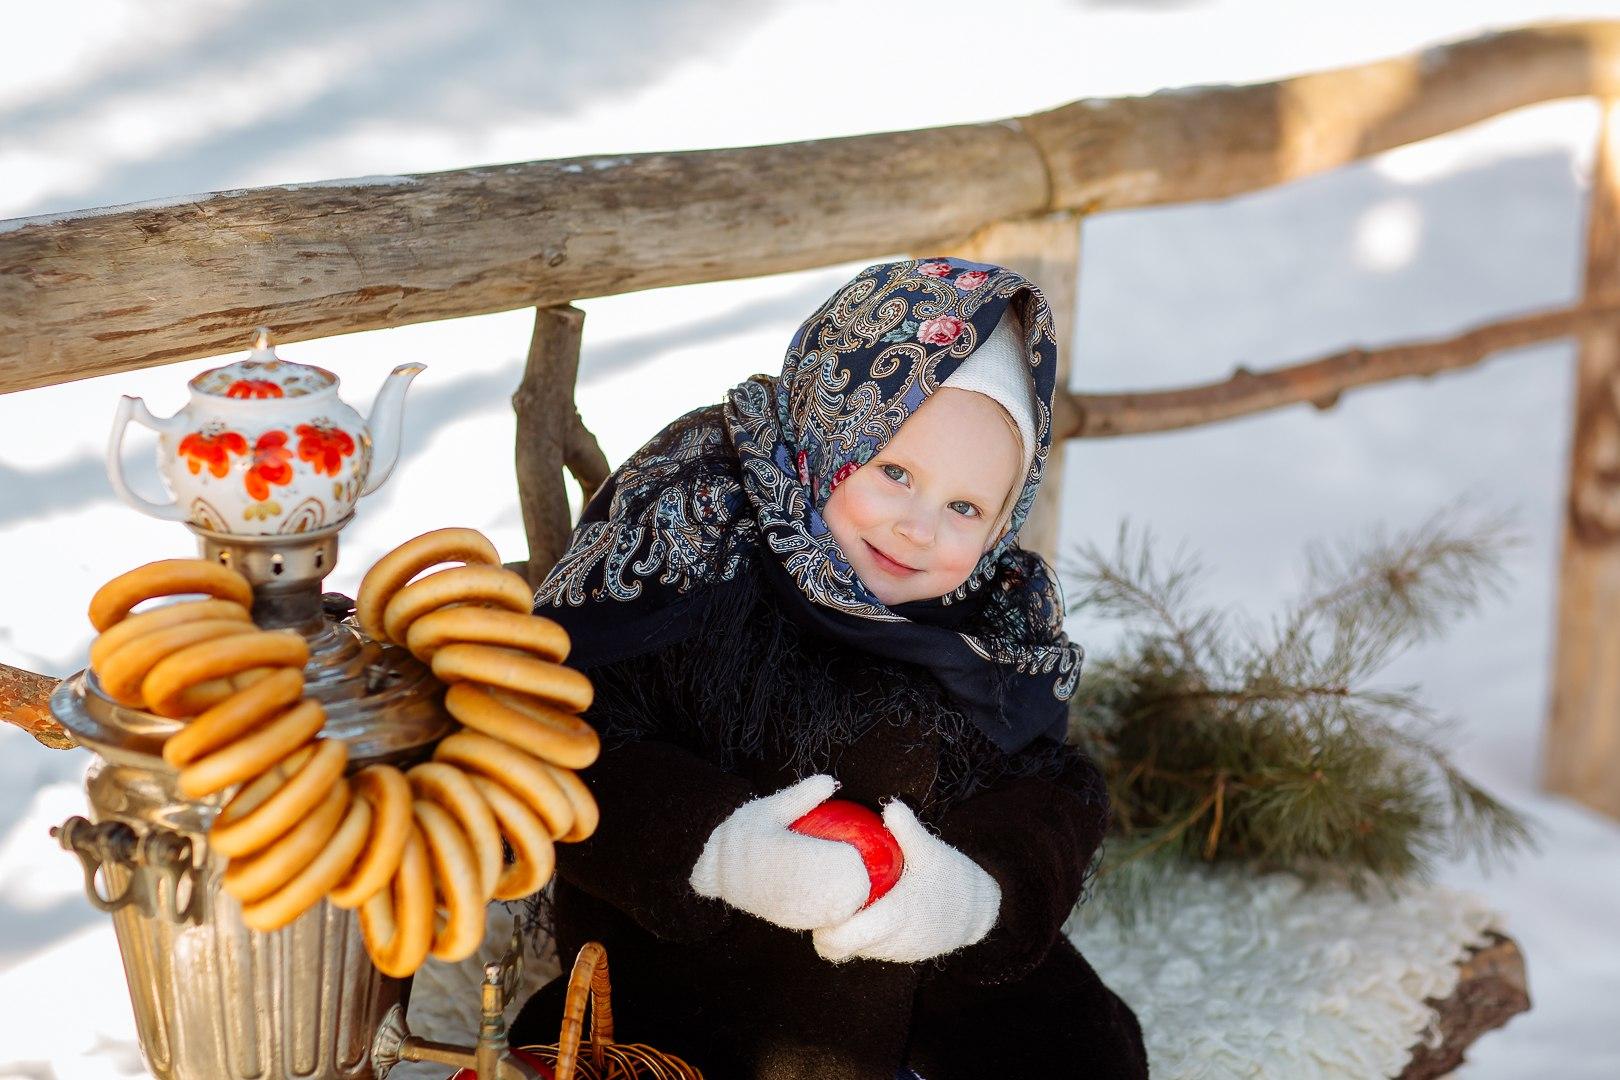 Русская красавица;). Зимний образ